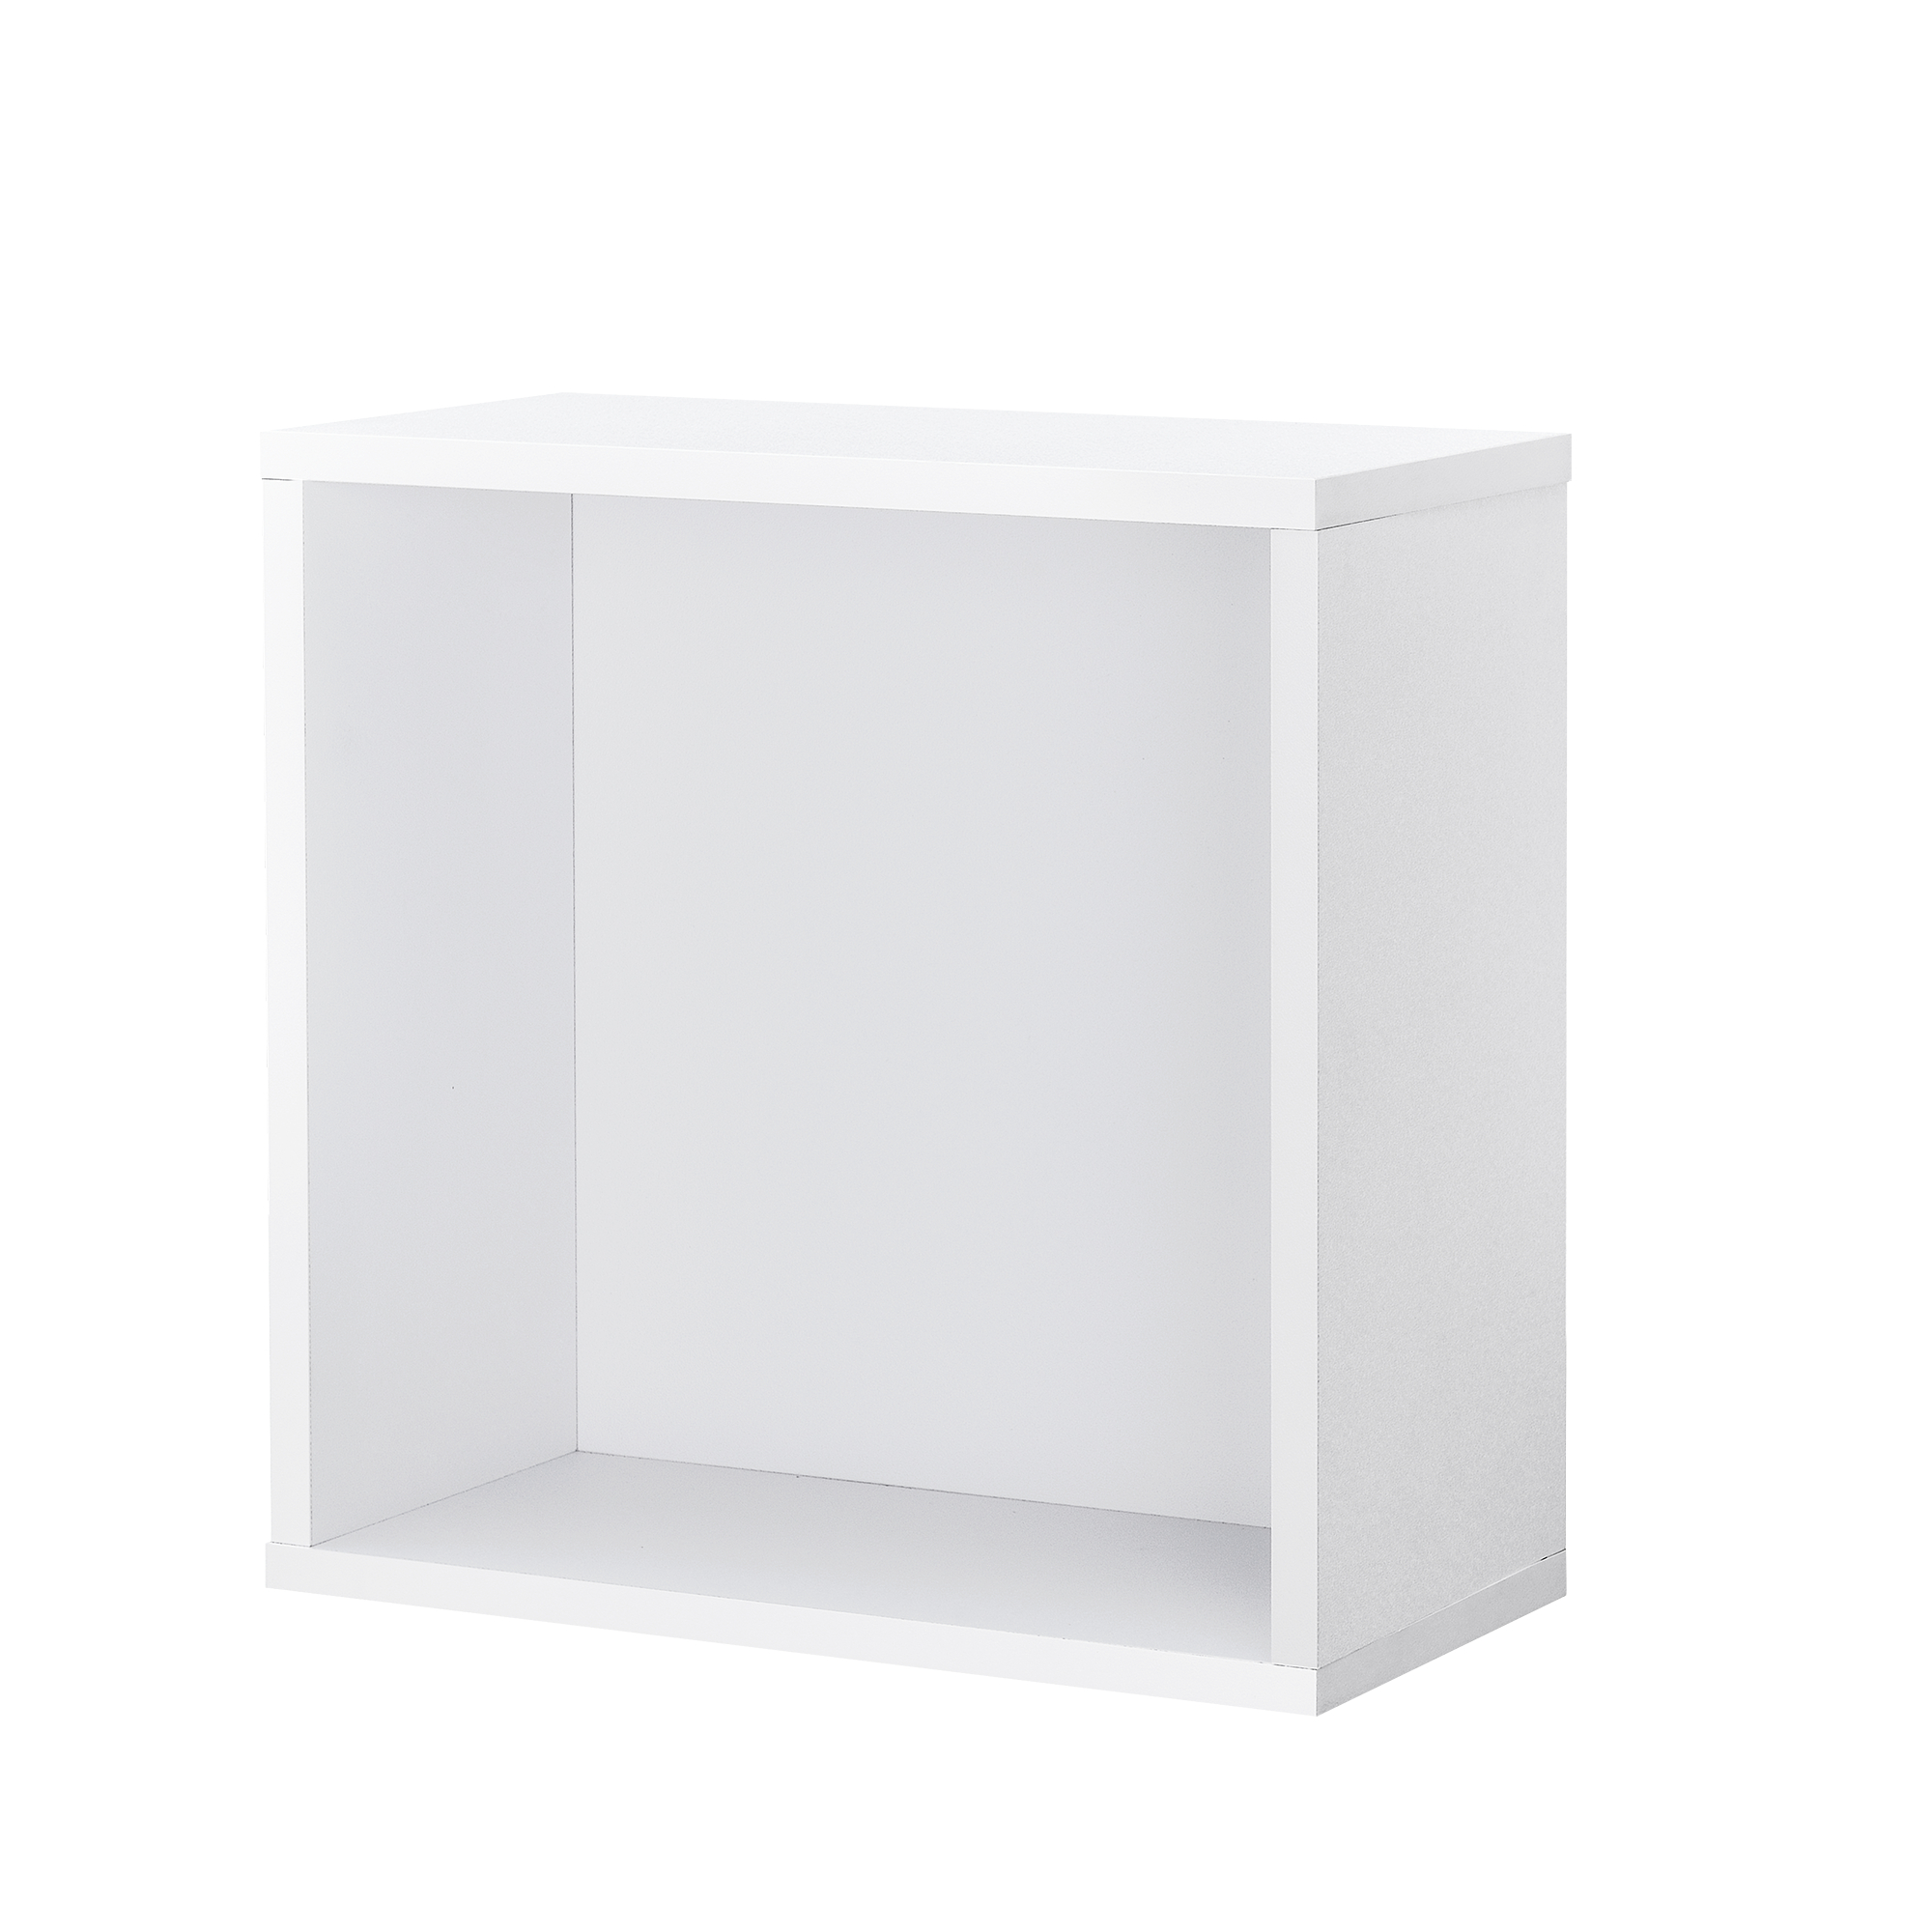 regal 30x30x15cm wei wandregal h ngeregal b cherregal kombinierbar ebay. Black Bedroom Furniture Sets. Home Design Ideas